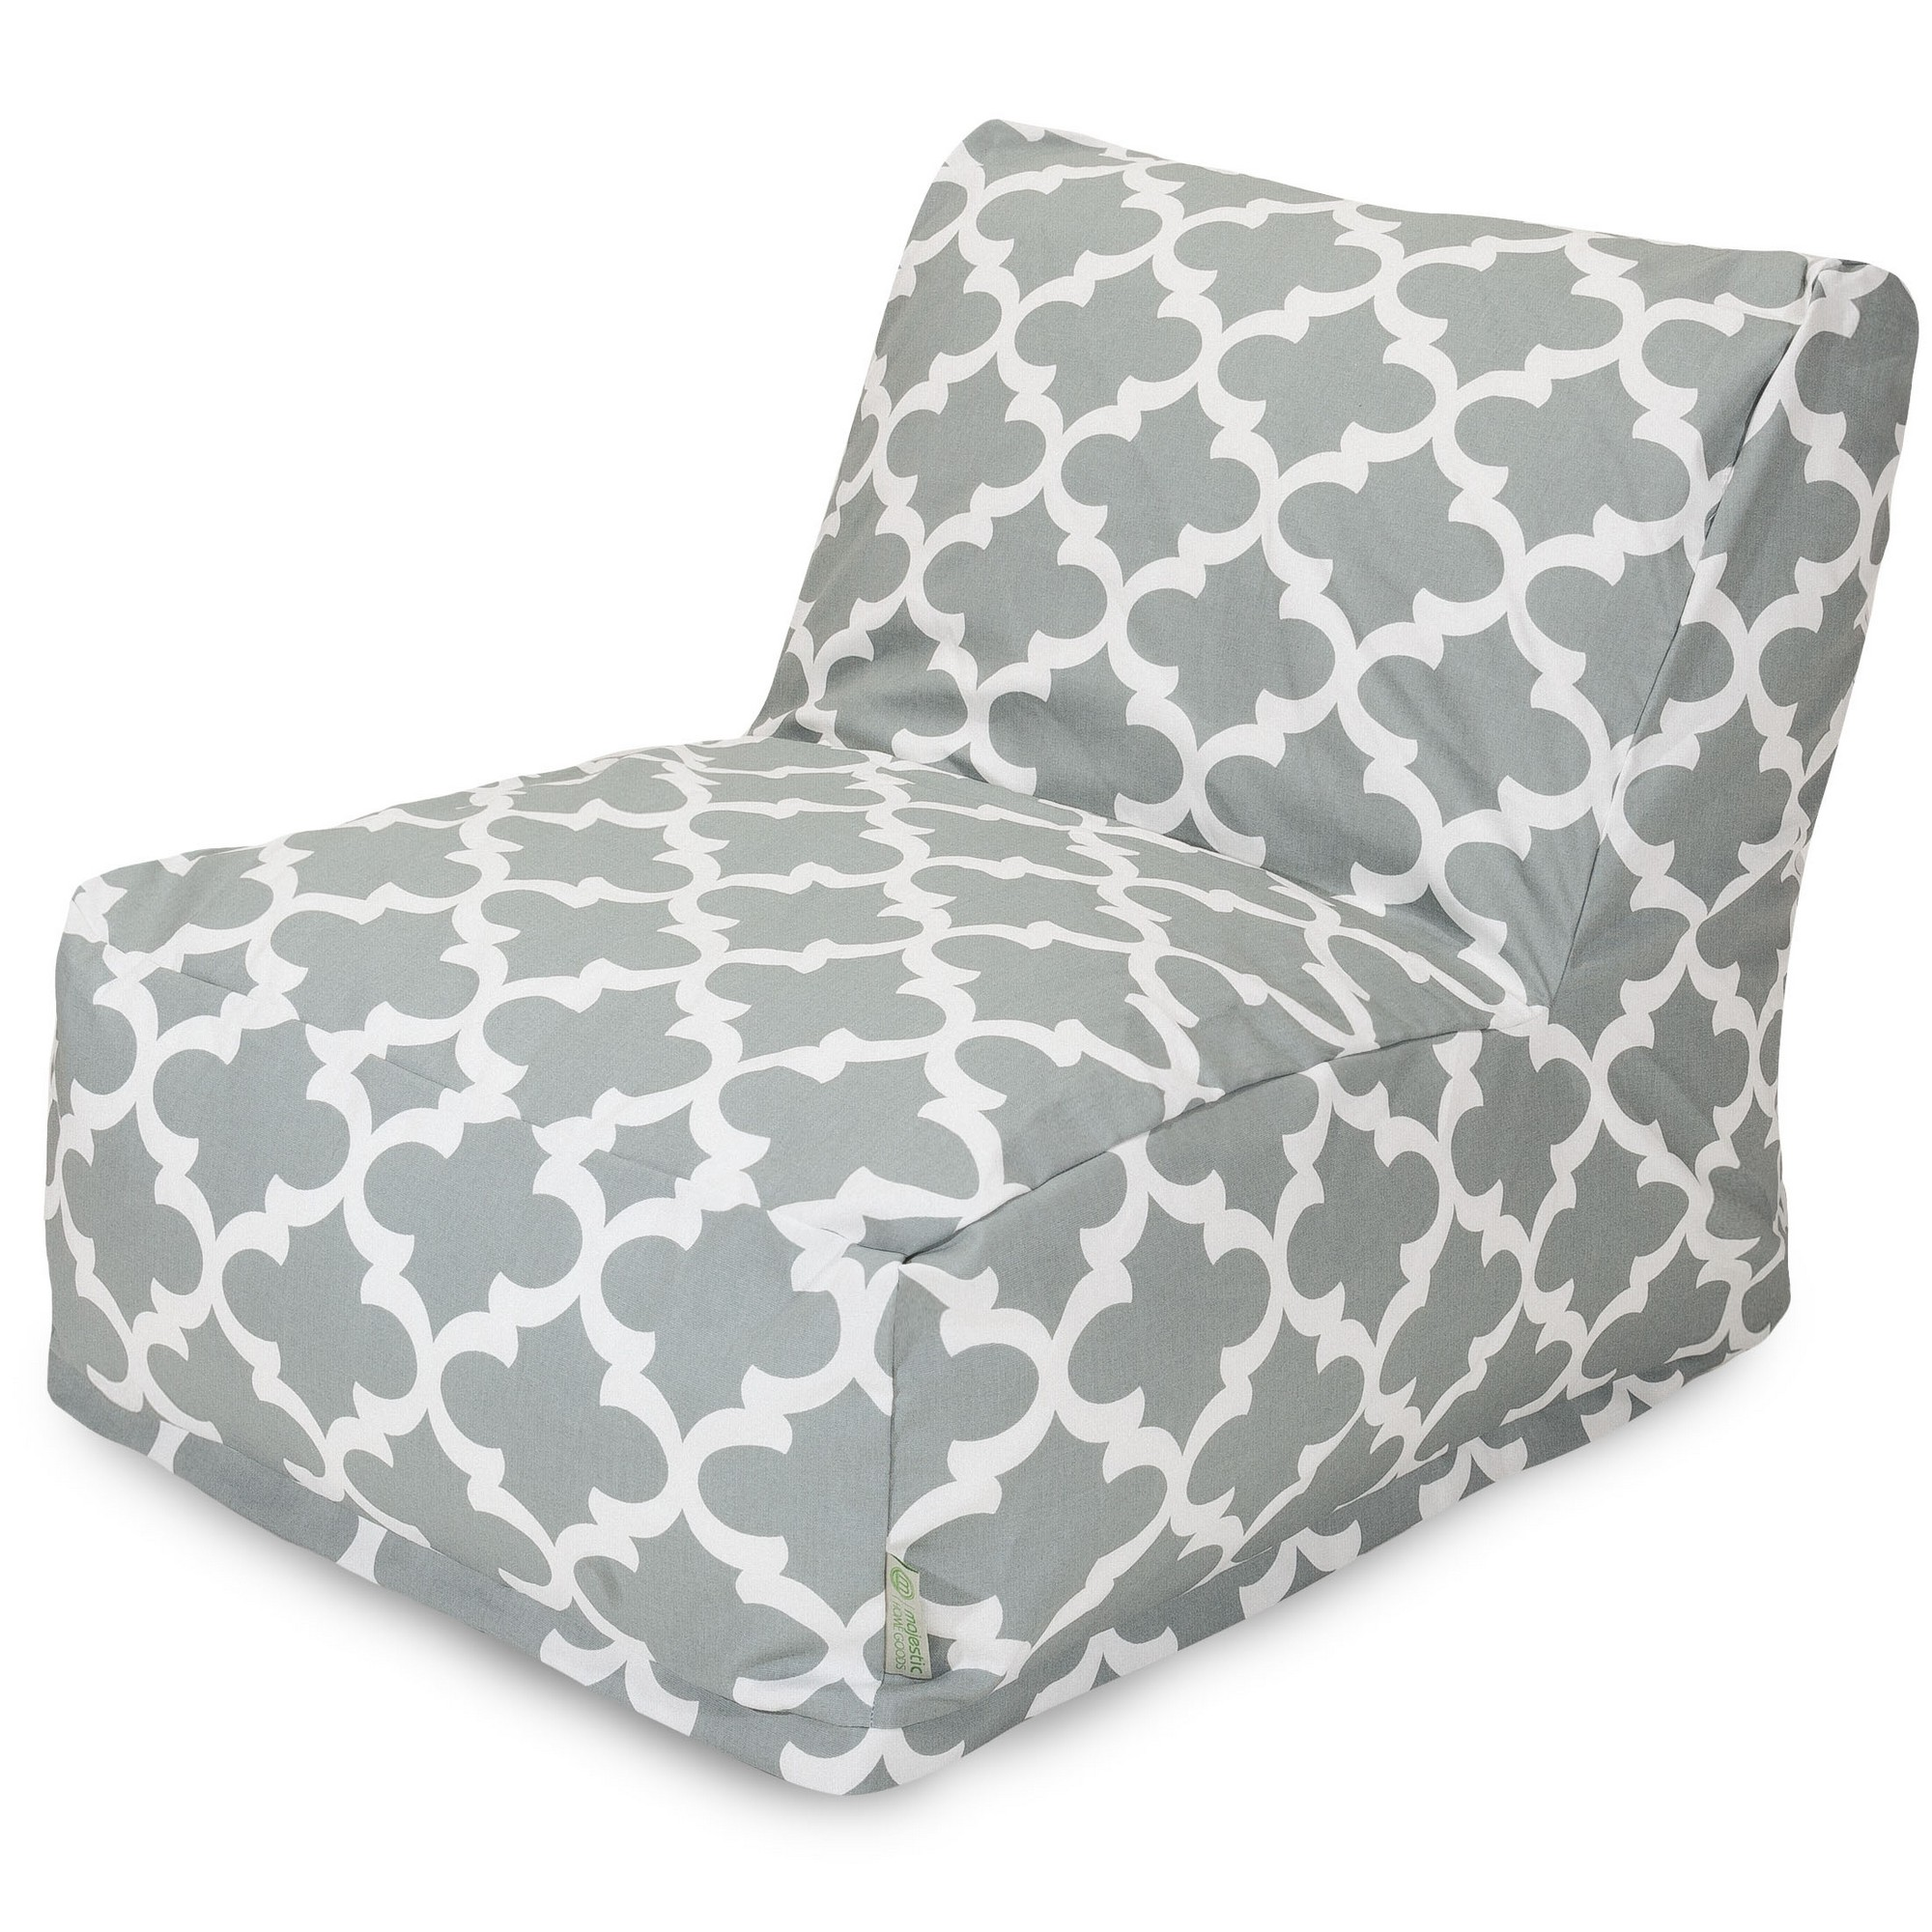 Majestic Home Goods LG Gray Trellis Bean Bag Chair Lounger